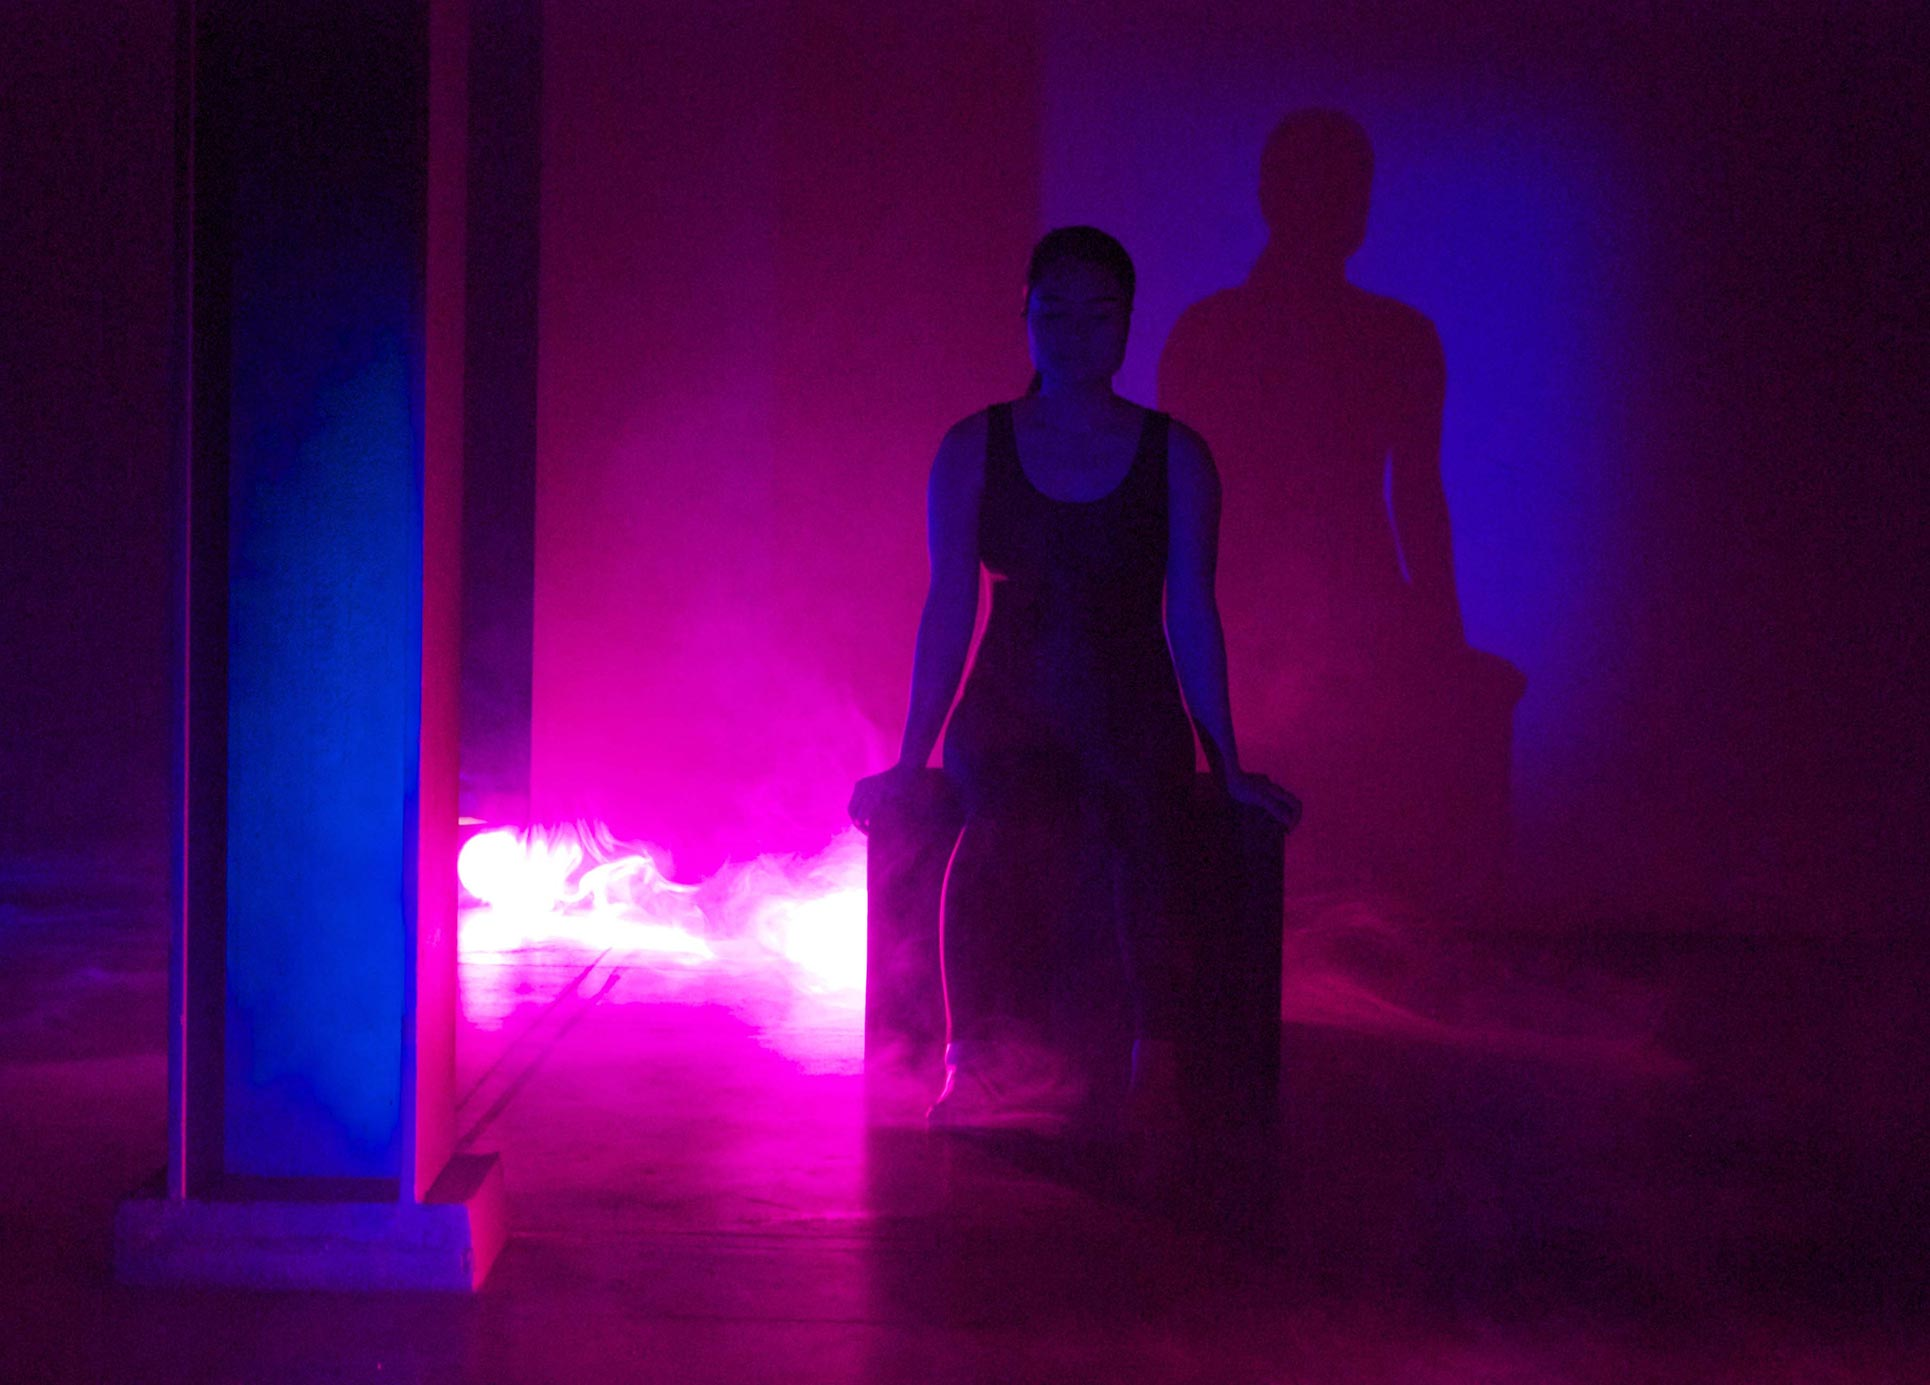 ArTransit, Performance Quynh Dong, Viafarini (Photo: Silvia Morin)